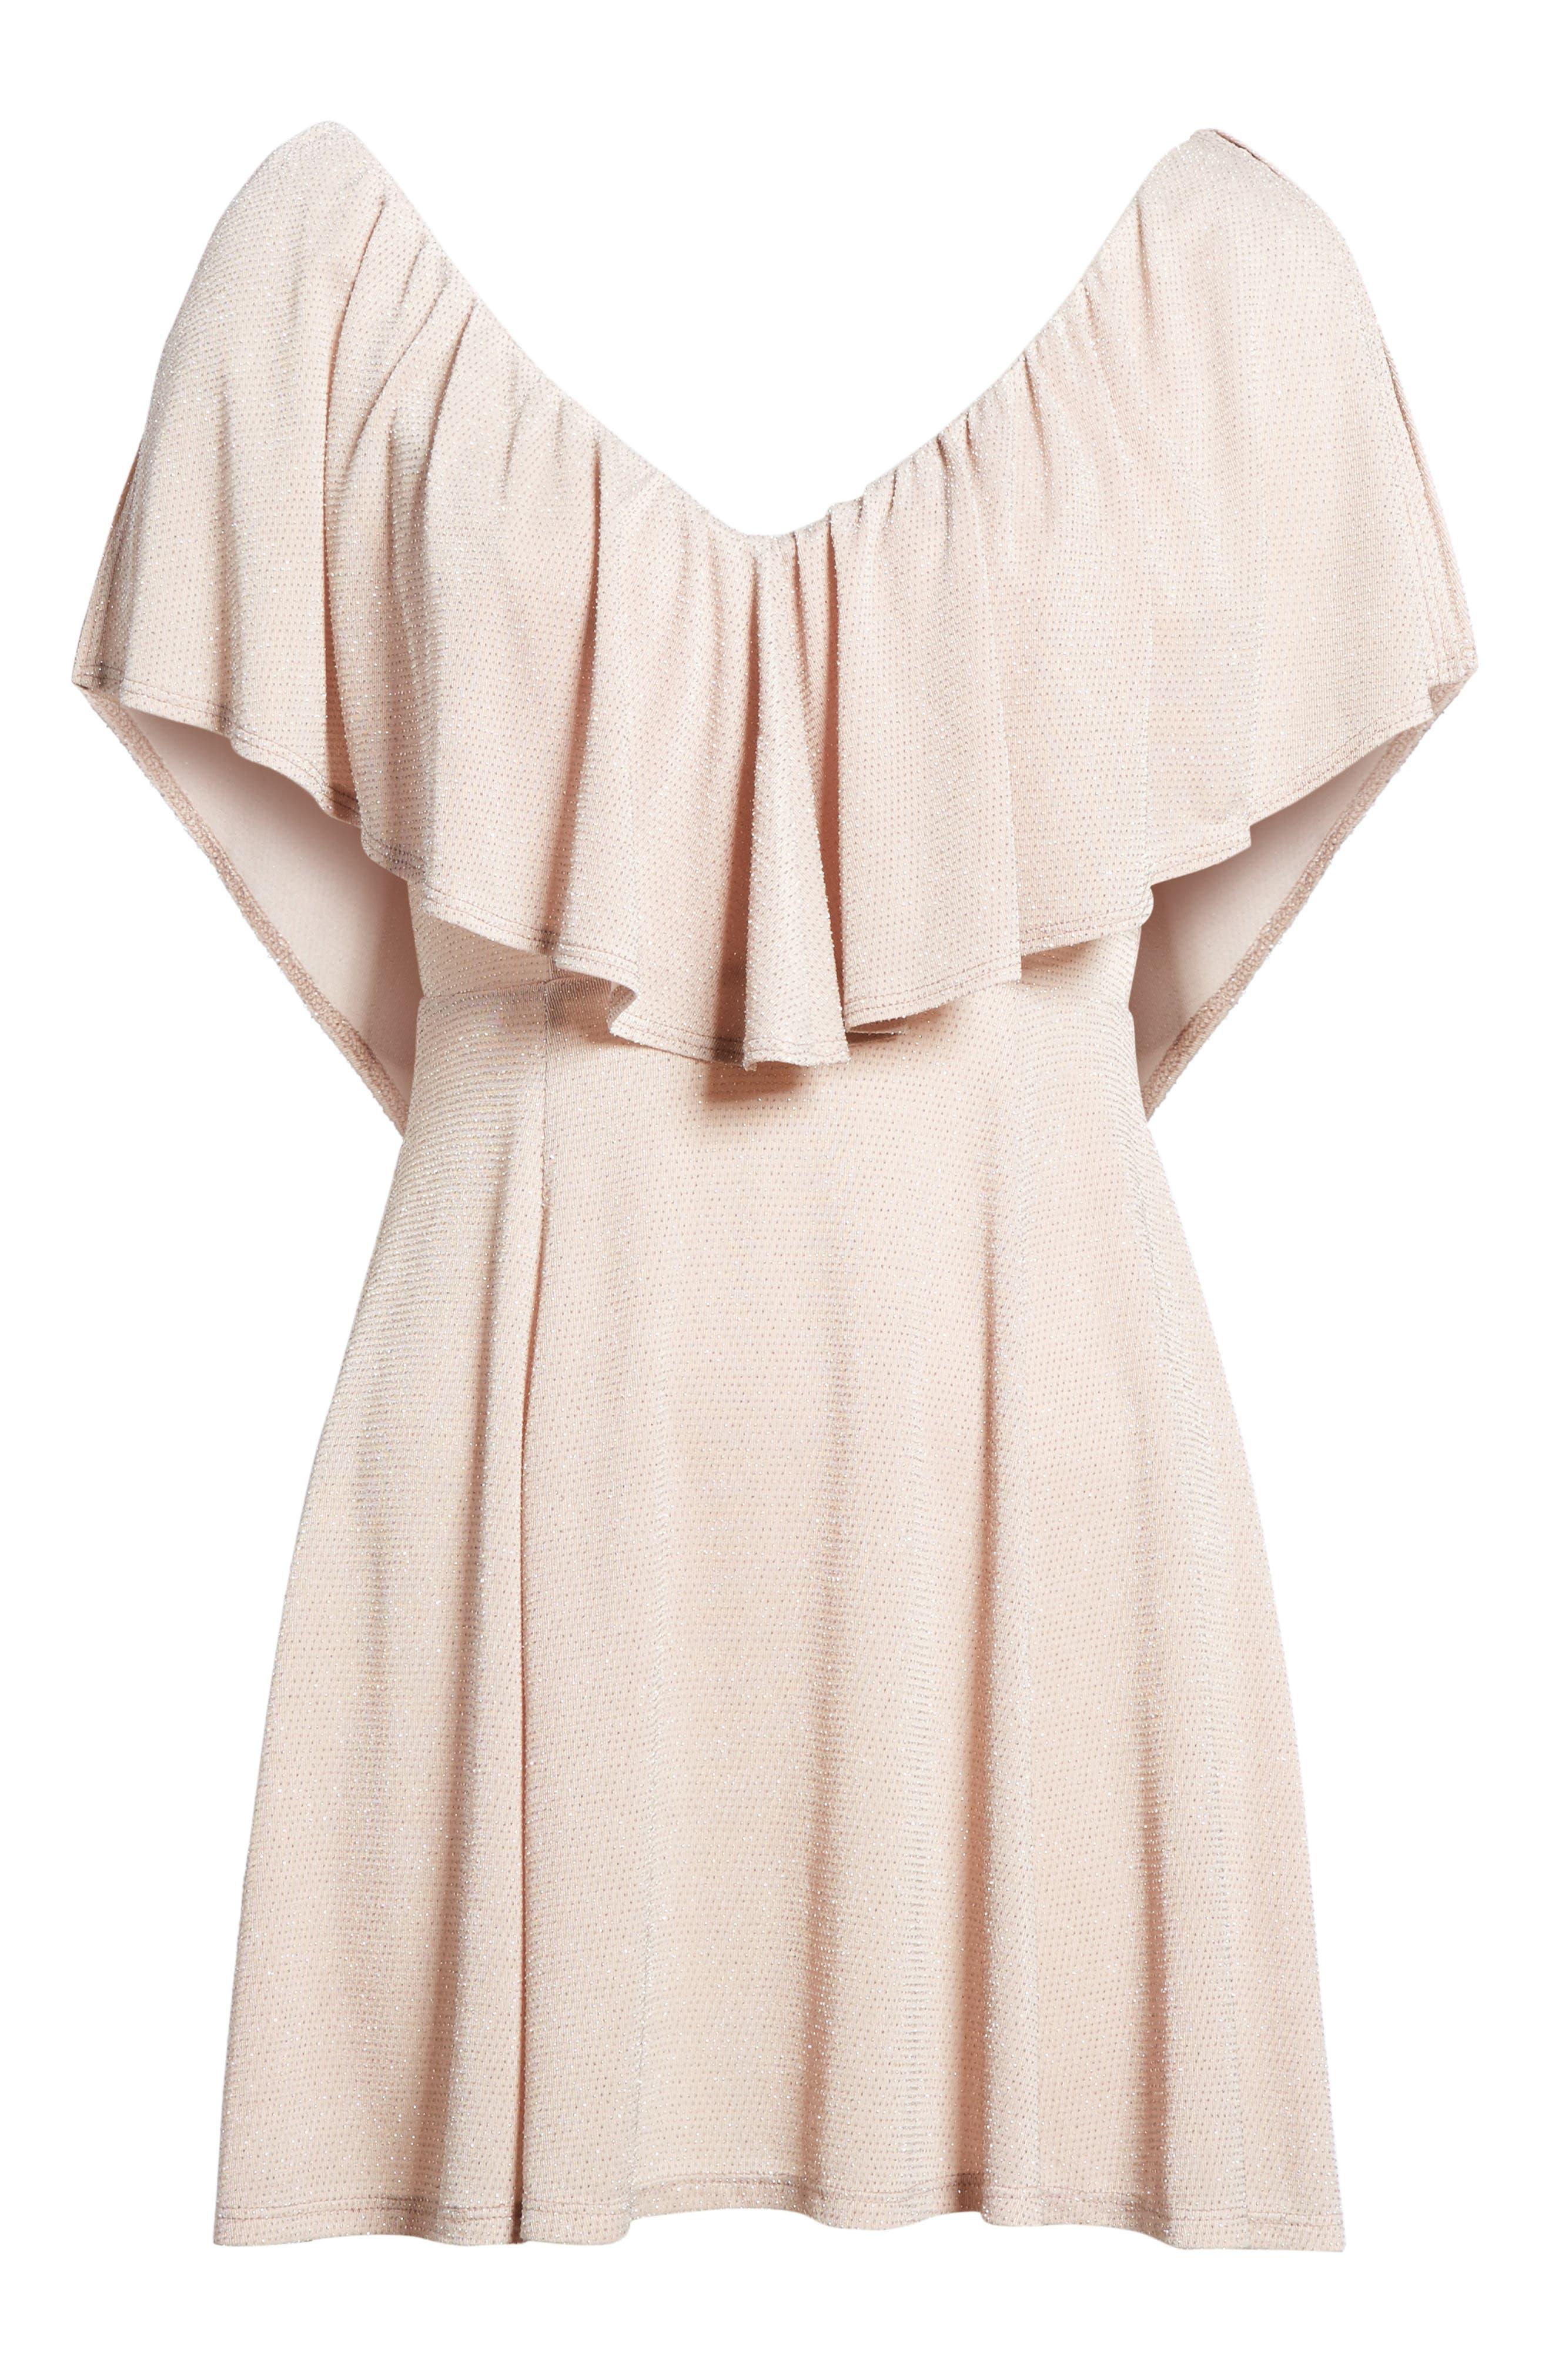 Daphne Ruffle Minidress,                             Alternate thumbnail 6, color,                             Dancing Queen Shine Blush